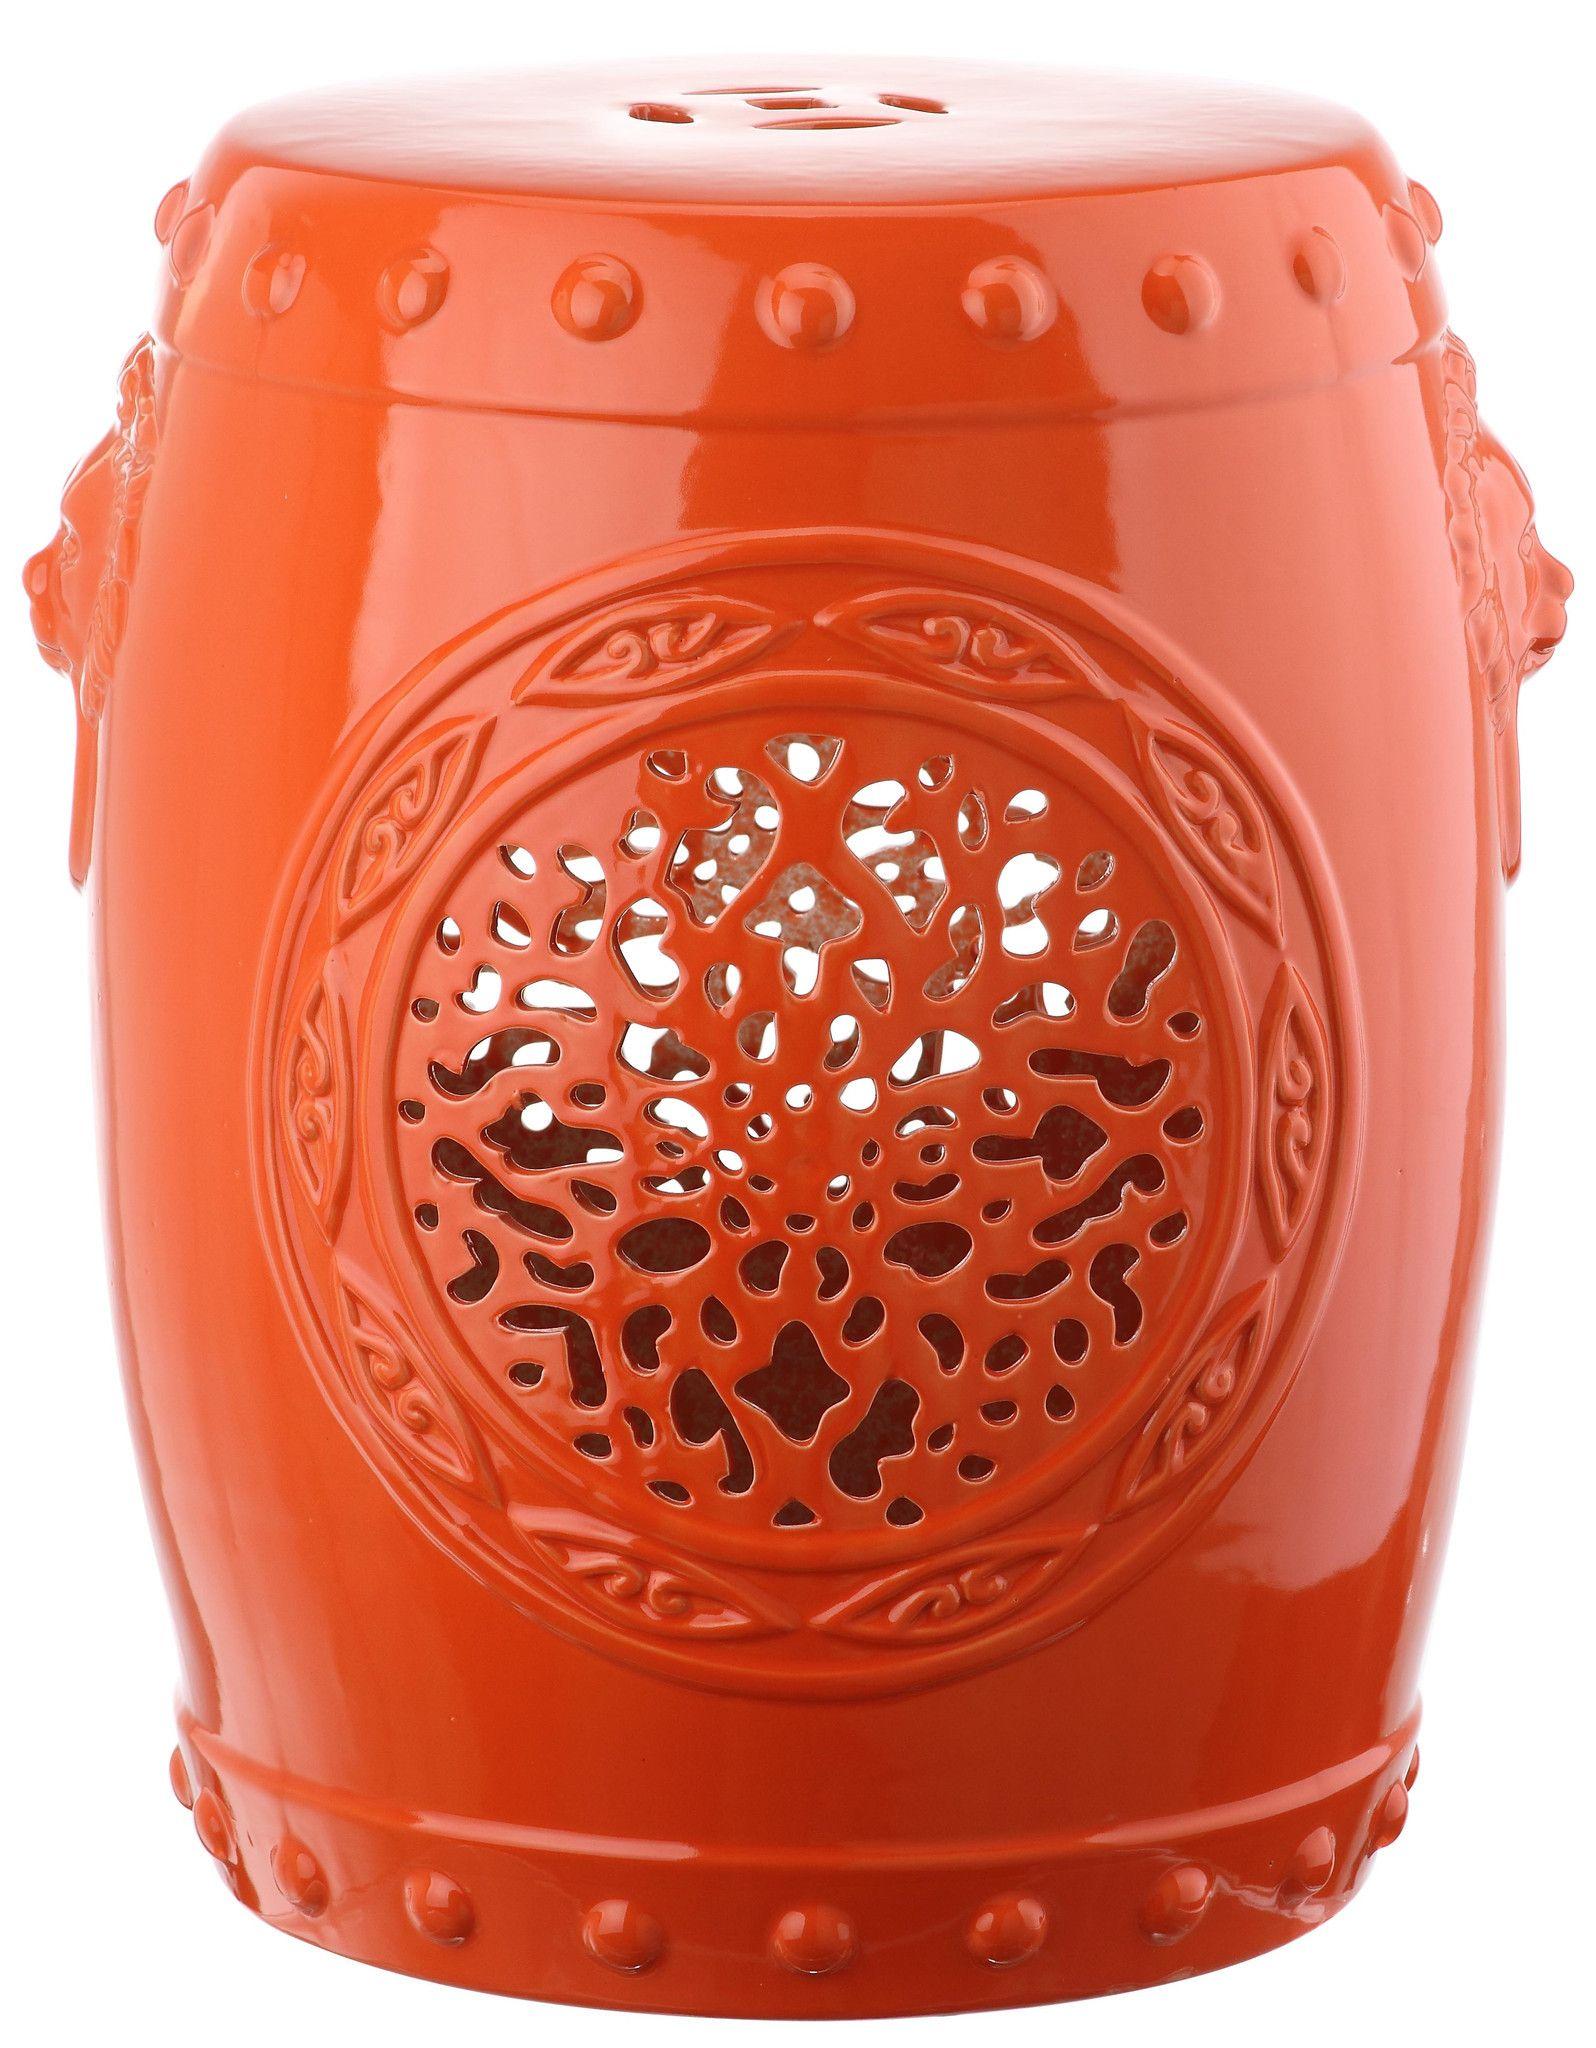 Orange Flower Drum Garden Stool Design By Safavieh Banco Jardim Azulejos Decoracao